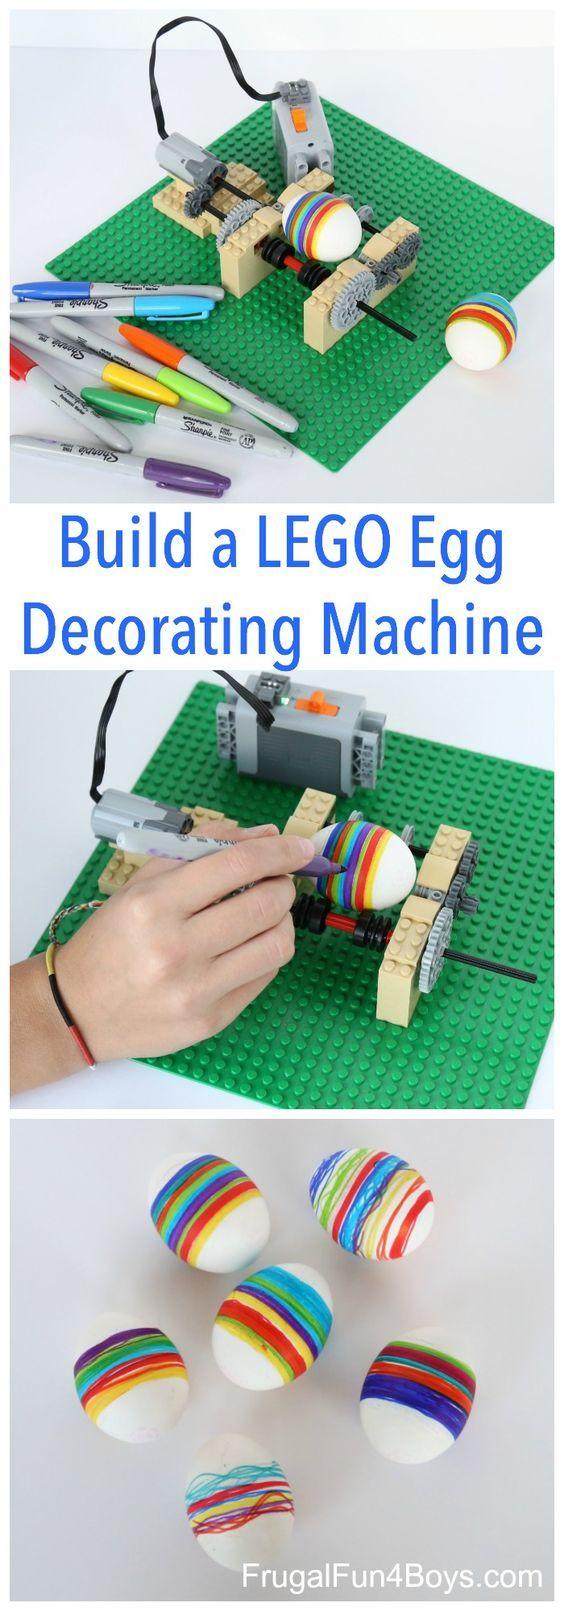 LEGO egg decorator machine -- cool engineering STEM project